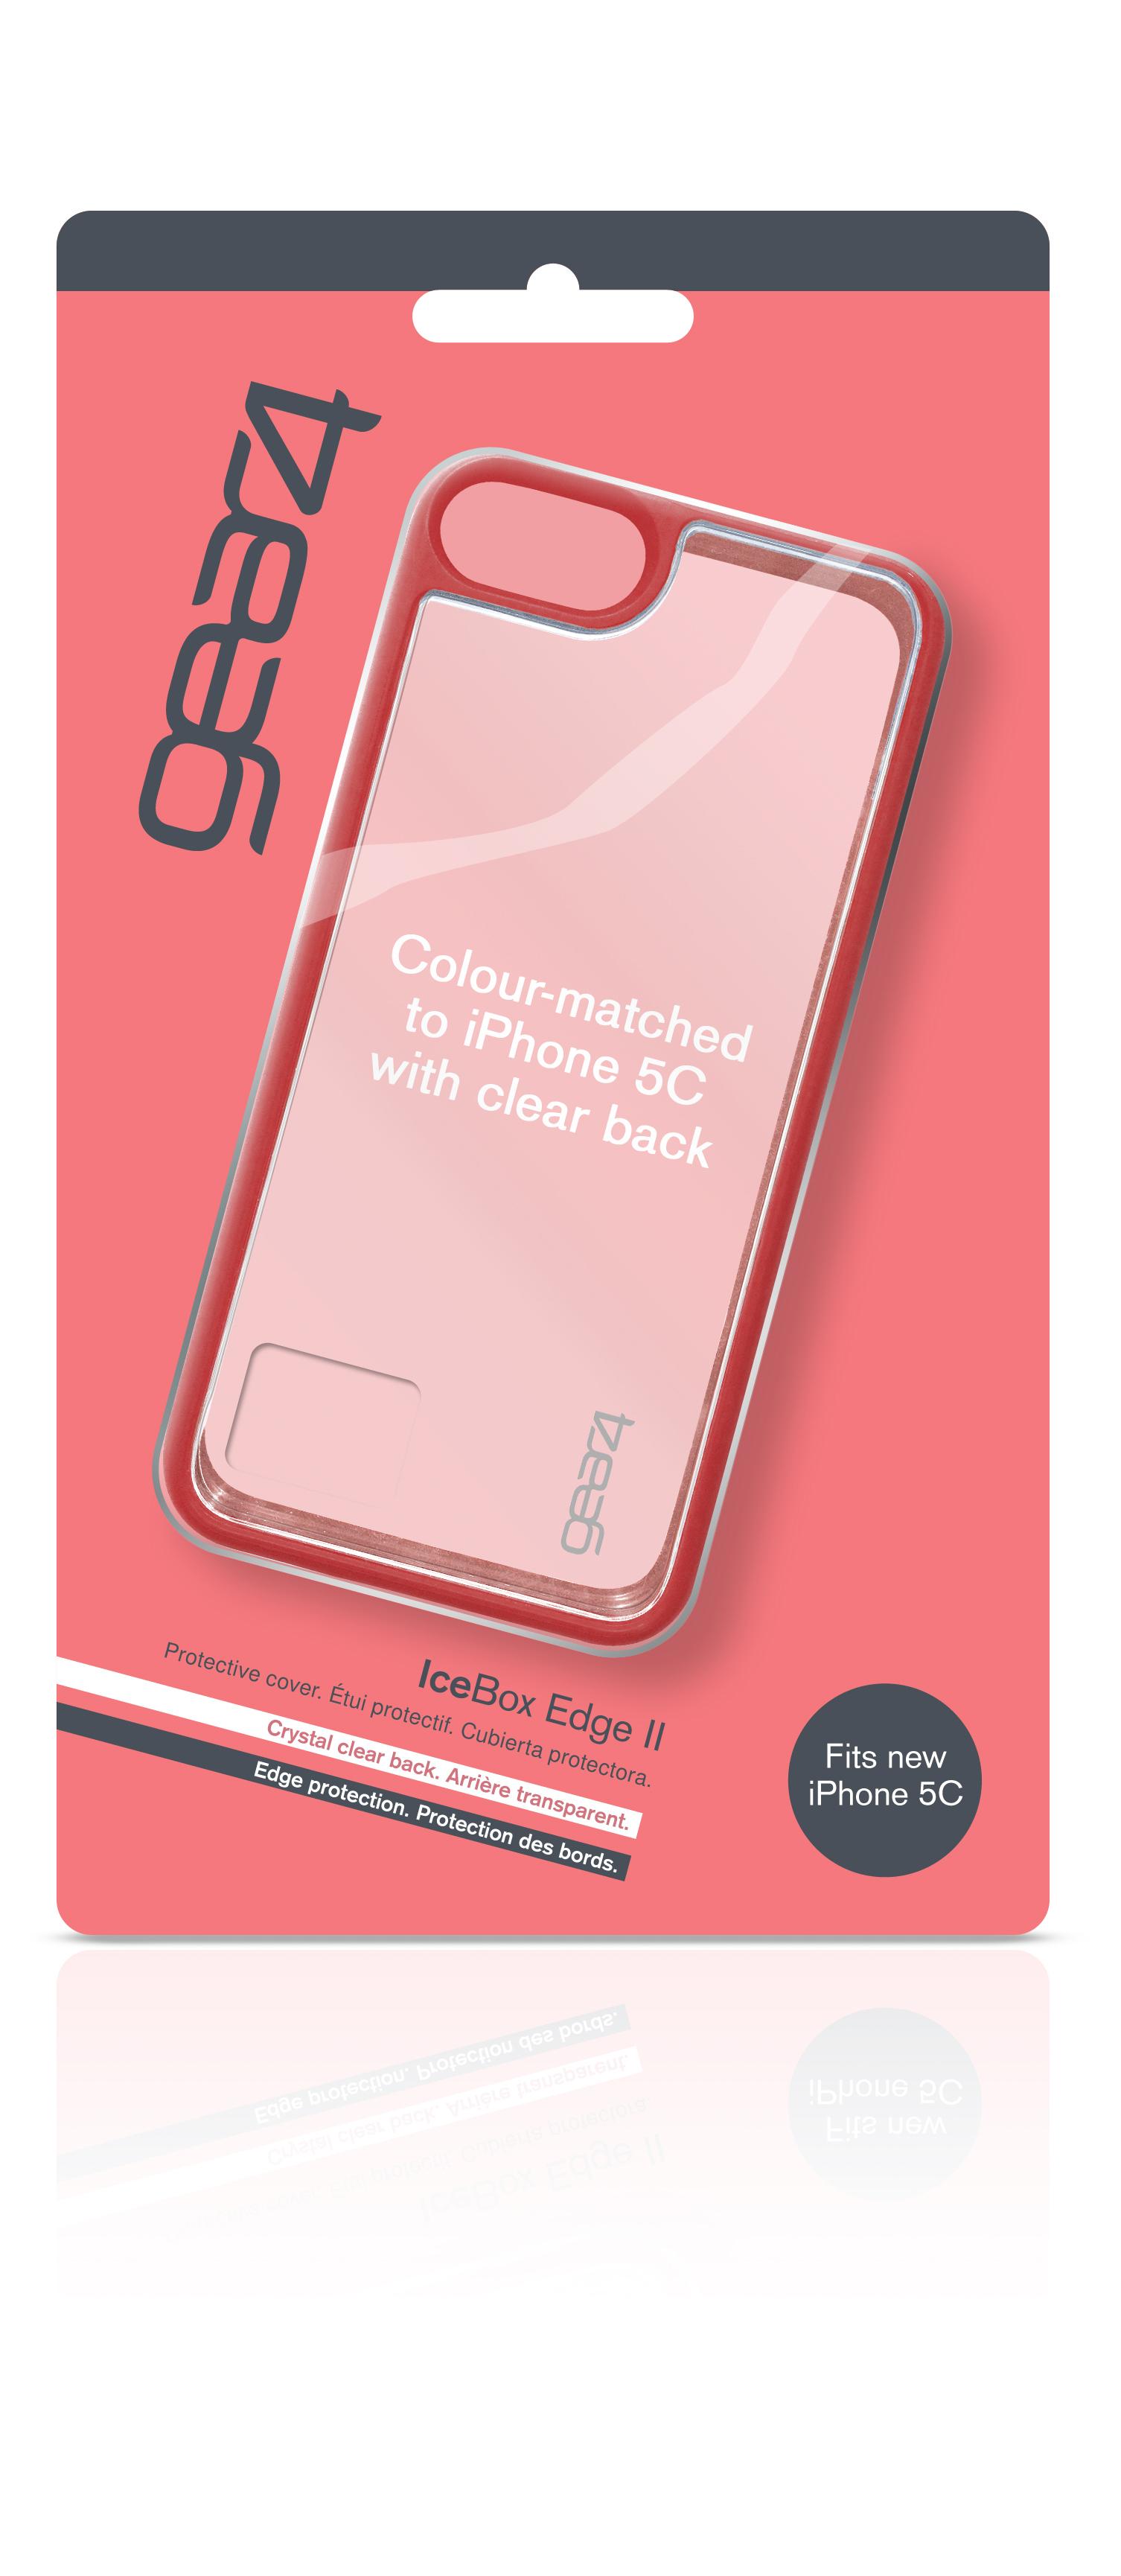 Coque Gear4 iPhone 5C rouge